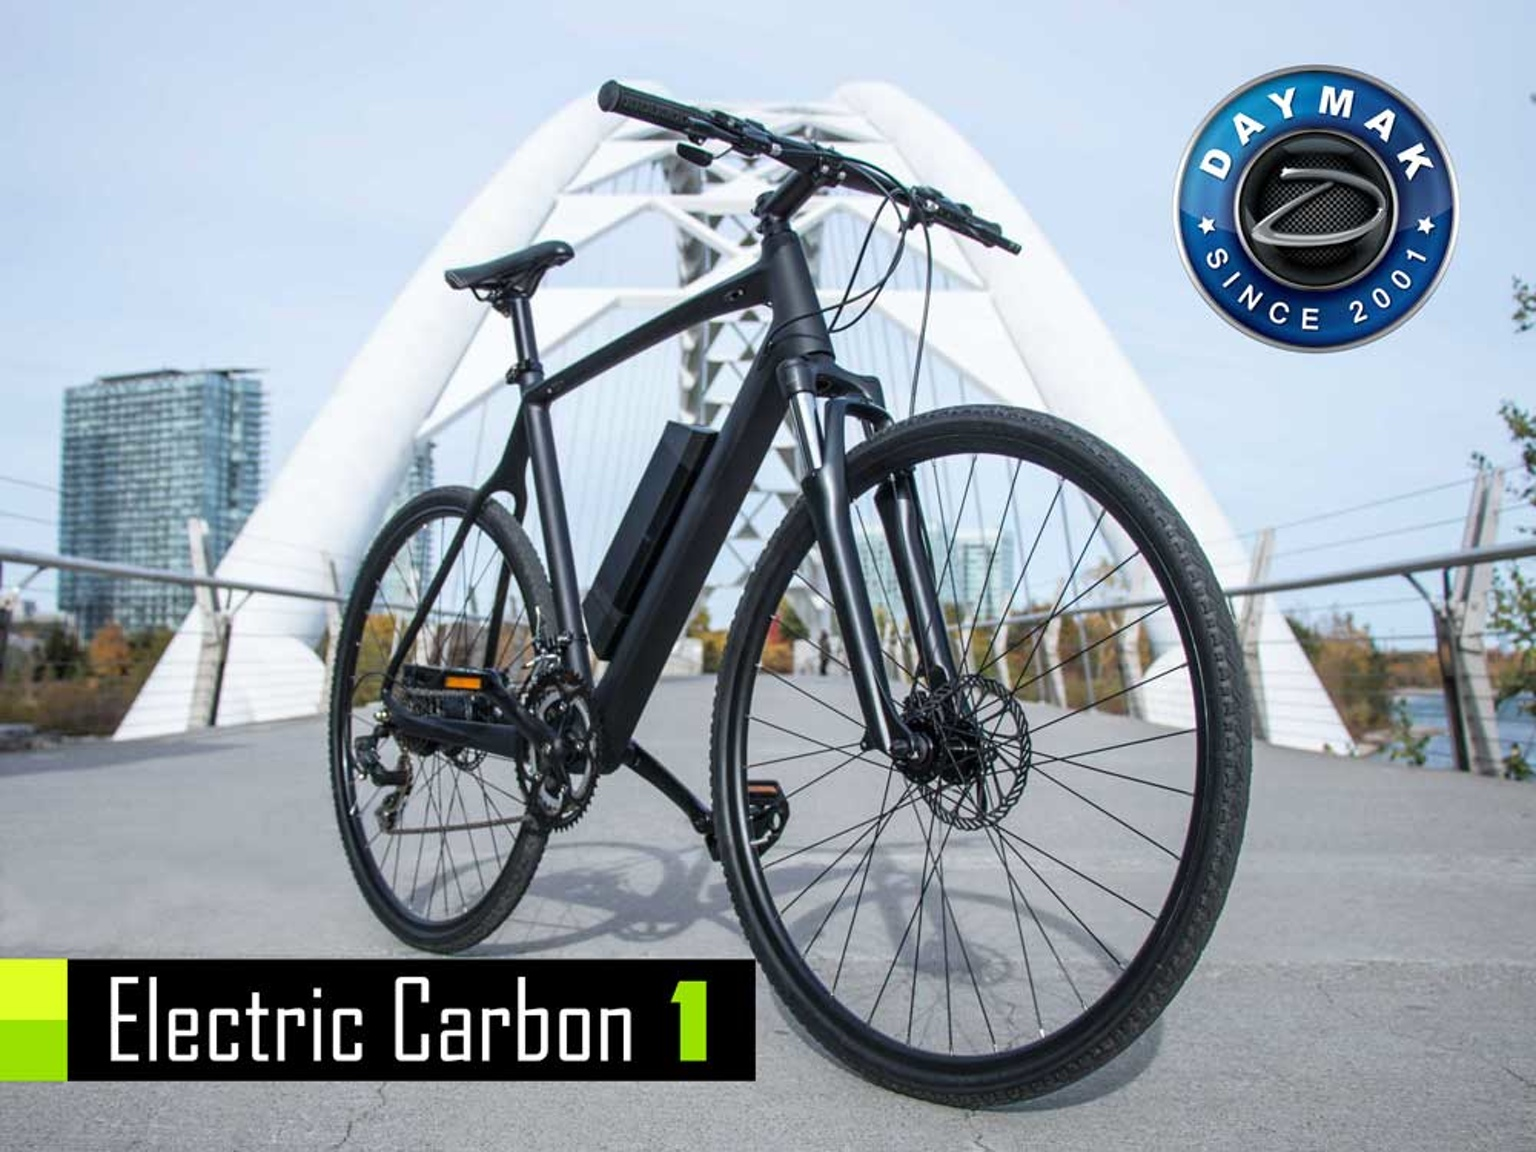 электрический велосипед Daymak ec1 презентация